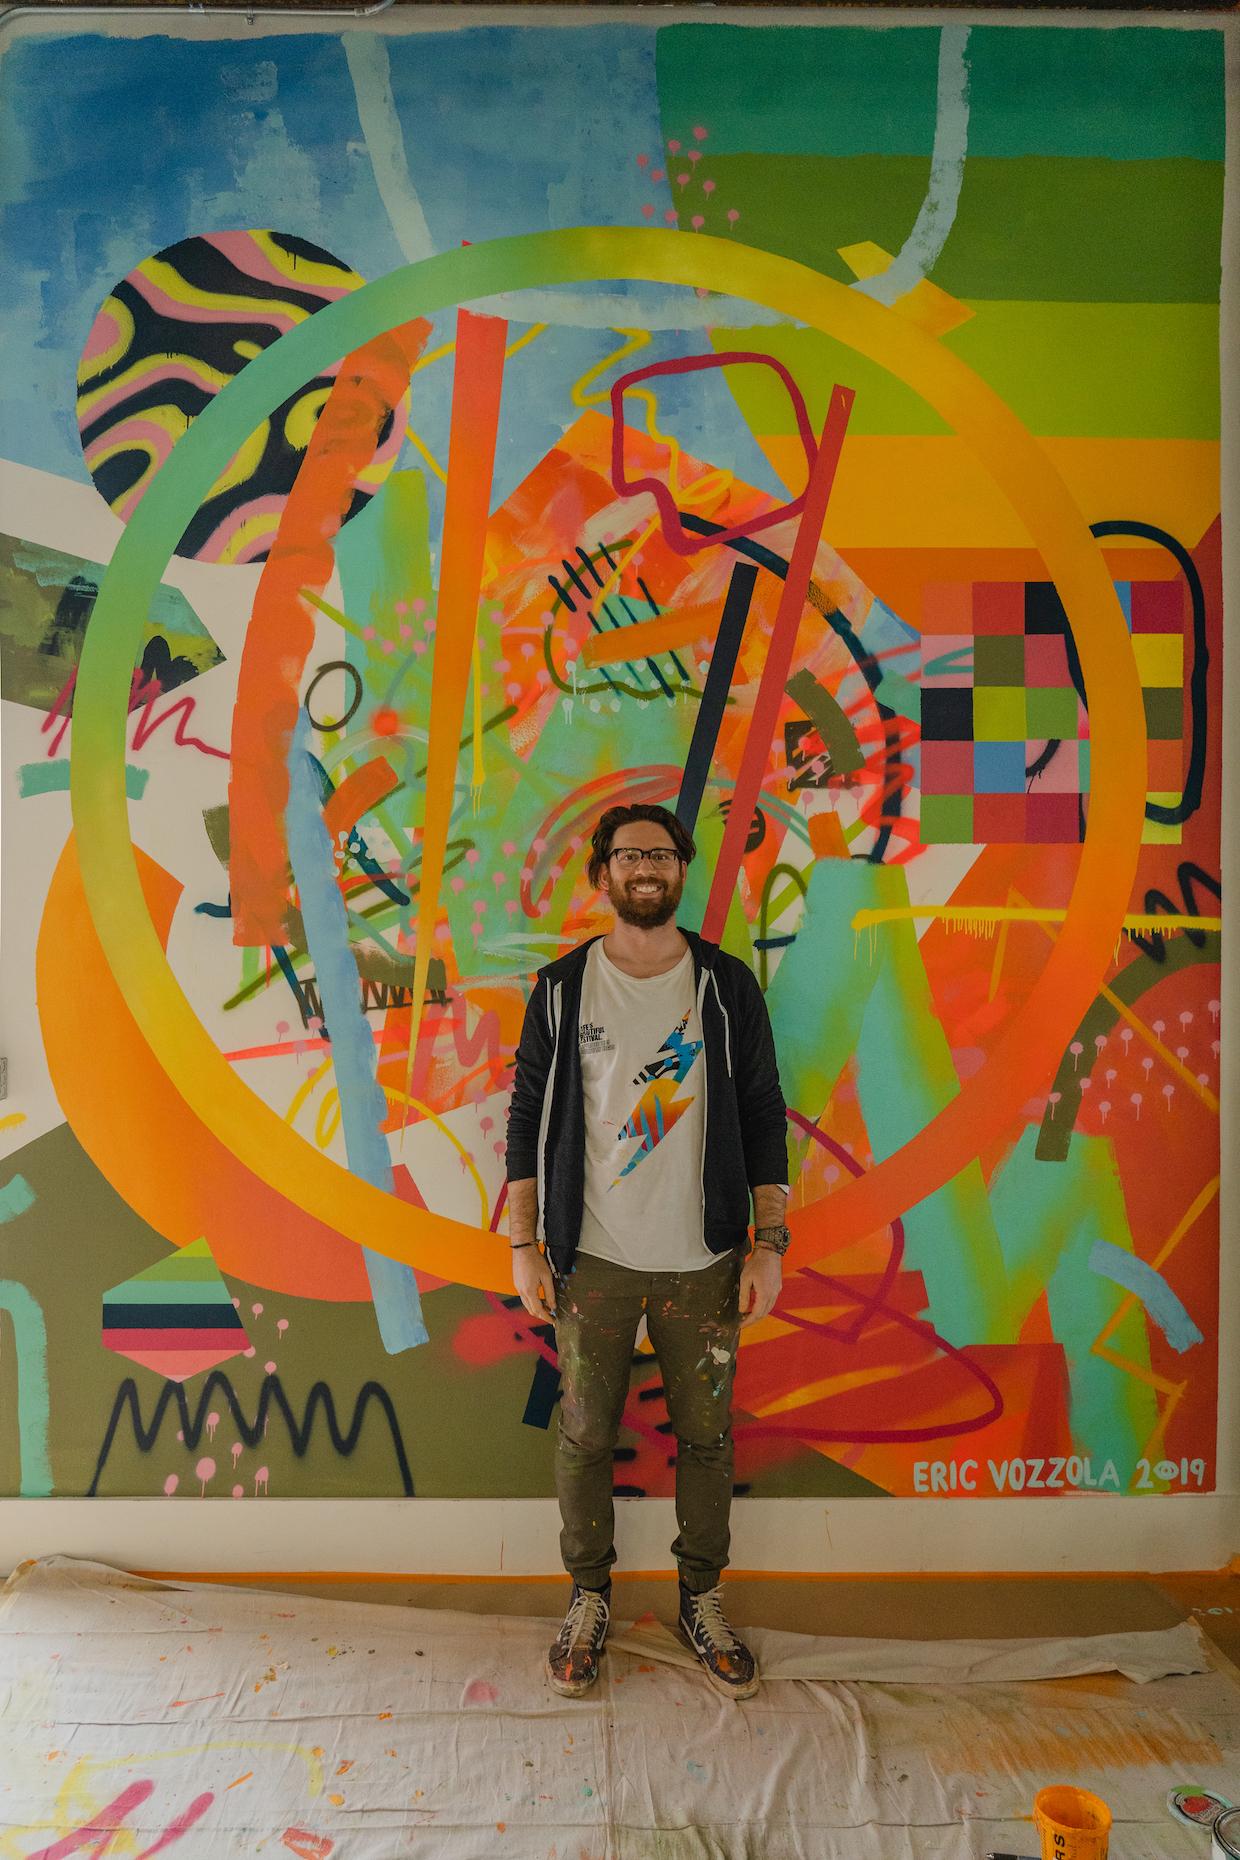 Eric Vozzola mural